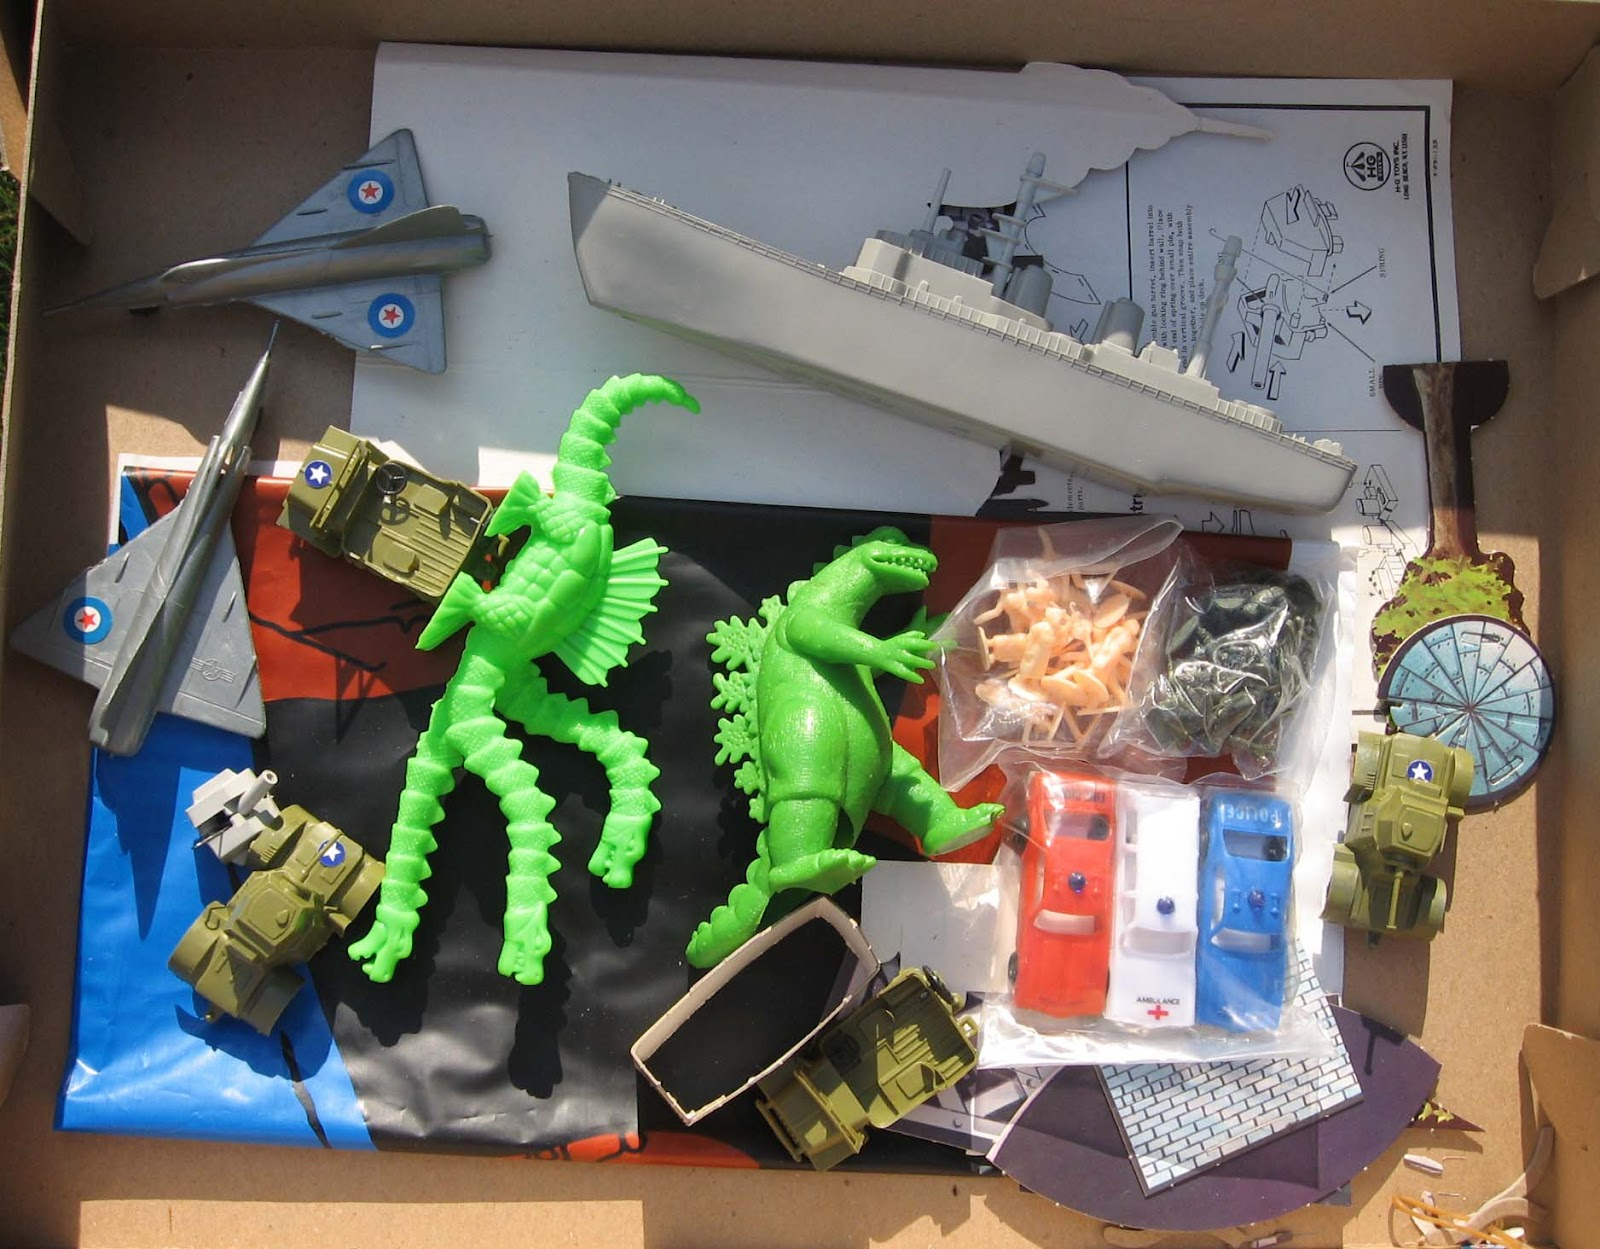 Materialist Zen 1978 Hg Toys Godzilla Battles The